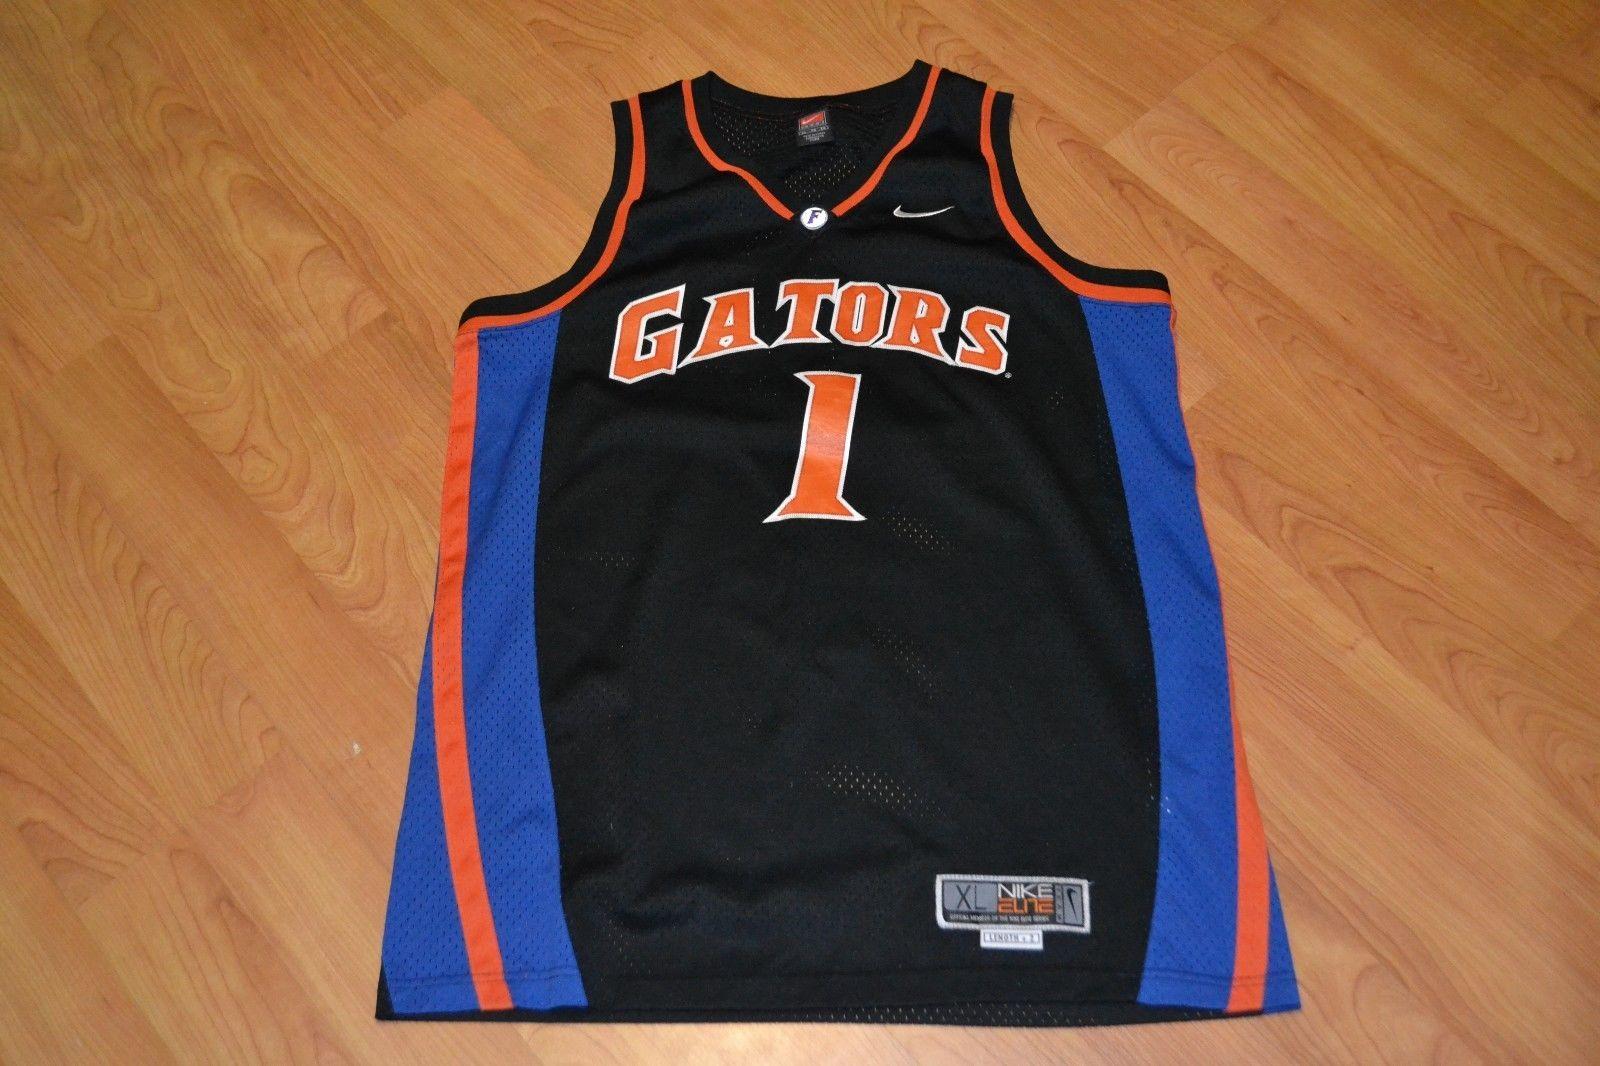 best website 34643 8c6d6 University Of Florida Gators Nike Elite Sewn Basketball ...